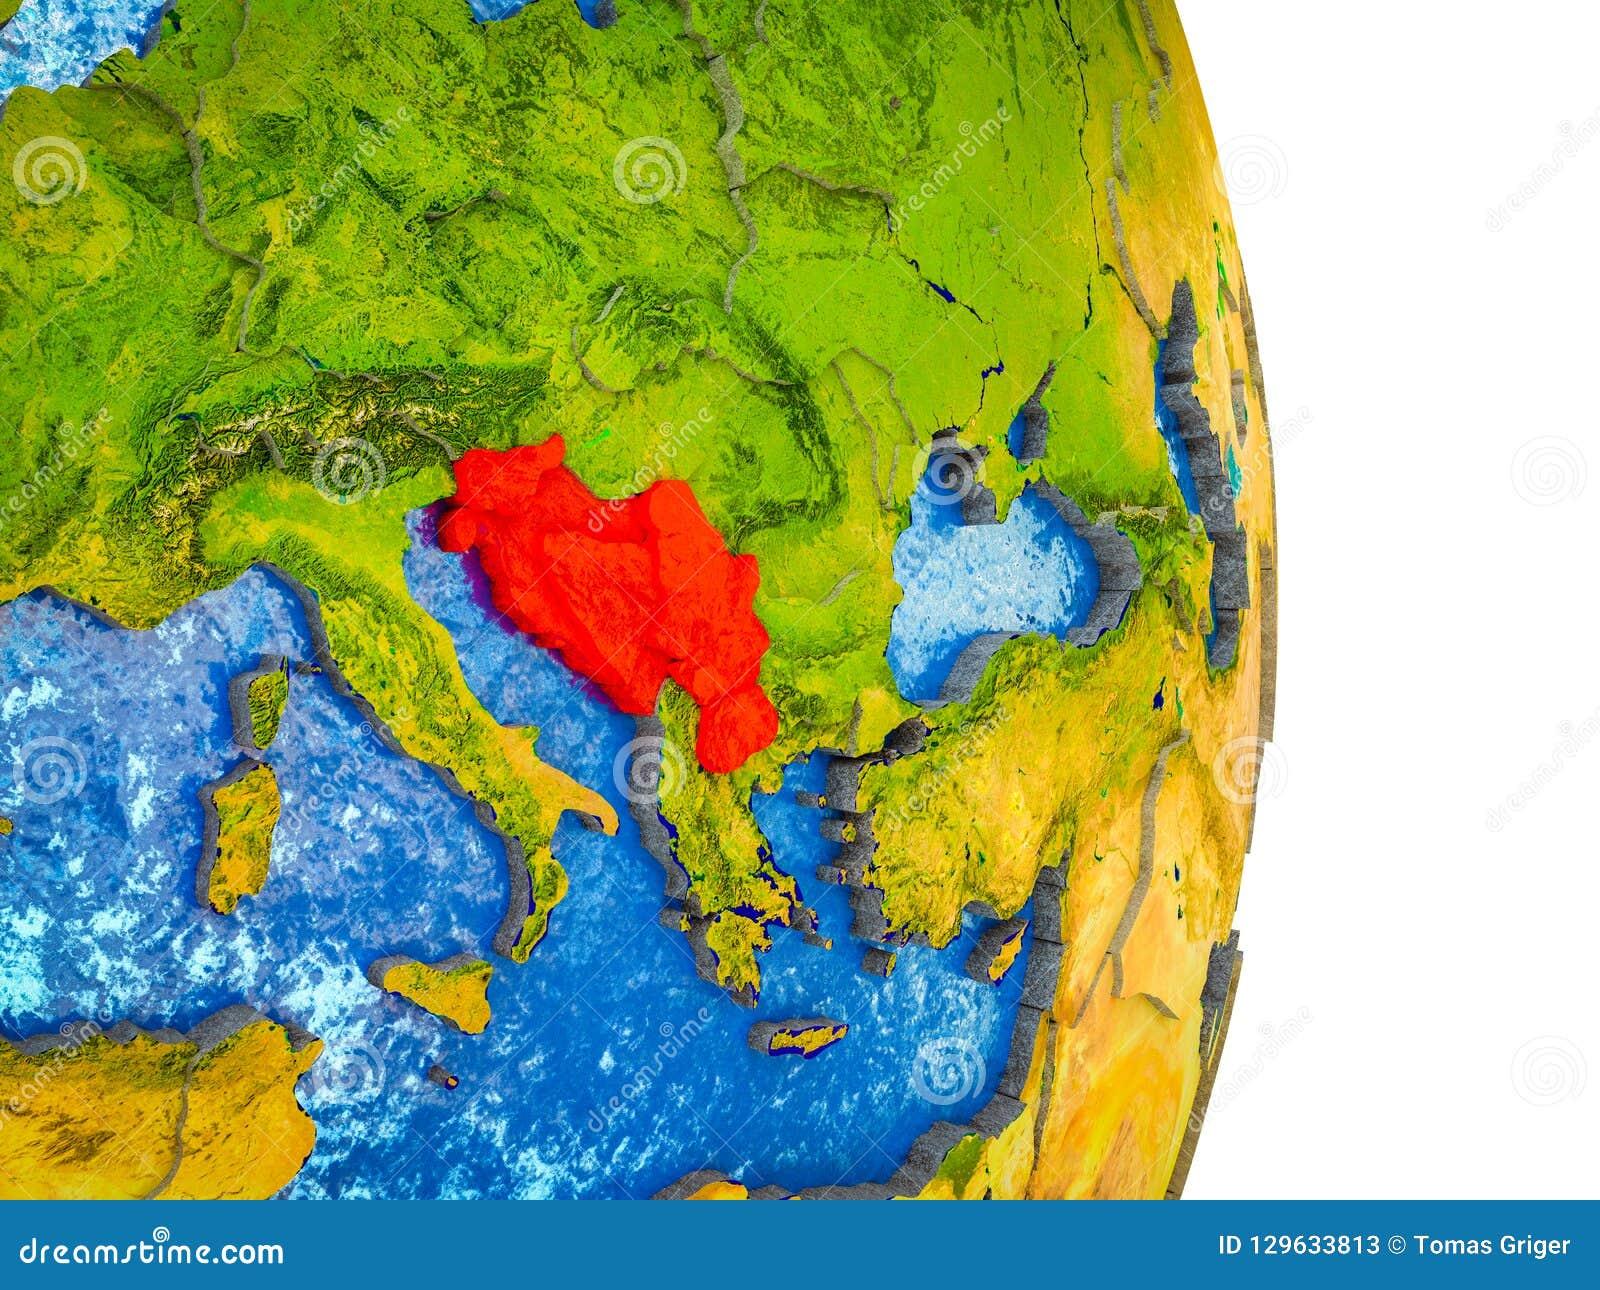 Map Of Former Yugoslavia On 3D Earth Stock Illustration ... Yugoslavia Map on russia map, lebanon map, slovenia map, great britain map, iraq map, bosnian map, armenia map, bosnia and herzegovina, yugoslav wars, turkey map, bosnia map, breakup of yugoslavia, alps map, republic of macedonia, josip broz tito, hungary map, vatican city map, solomon islands map, europe map, ethnic map, darfur map, balkans map, brazil map, kosovo war, italy map, germany map, soviet union, bosnian war,